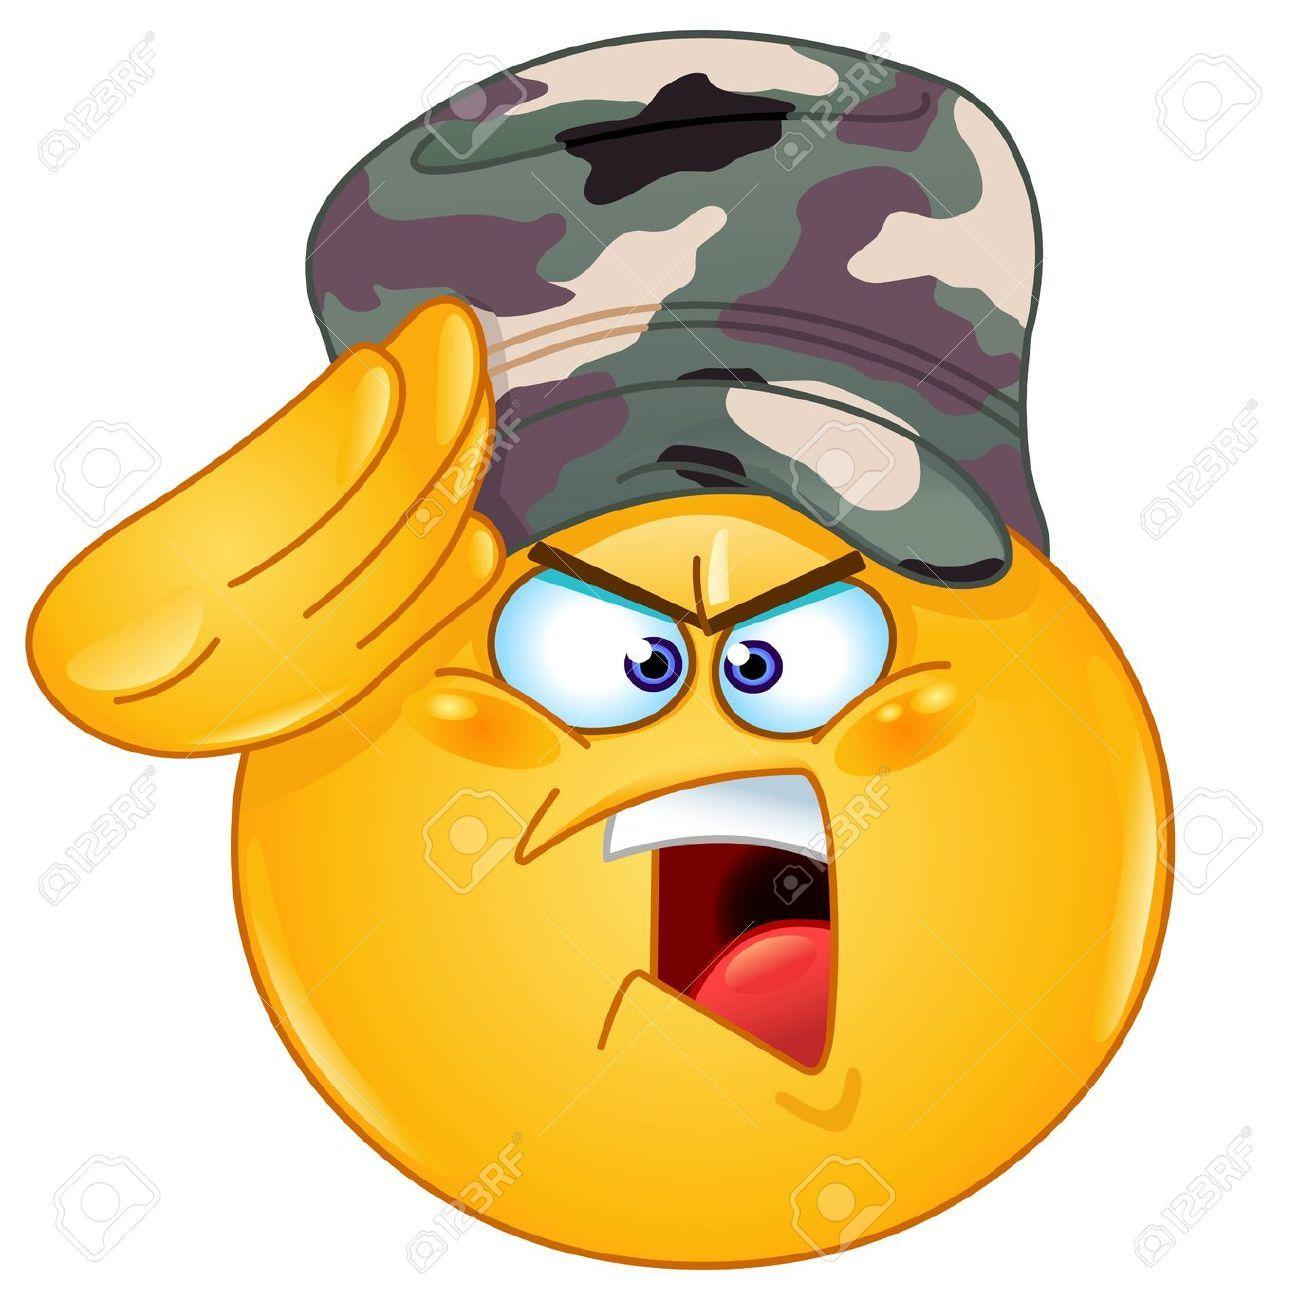 18539896 soldado saludando emoticon decir s se or foto de archivo saluting soldier smiley copy send share send in a message share on a timeline or copy and paste in your comments buycottarizona Choice Image